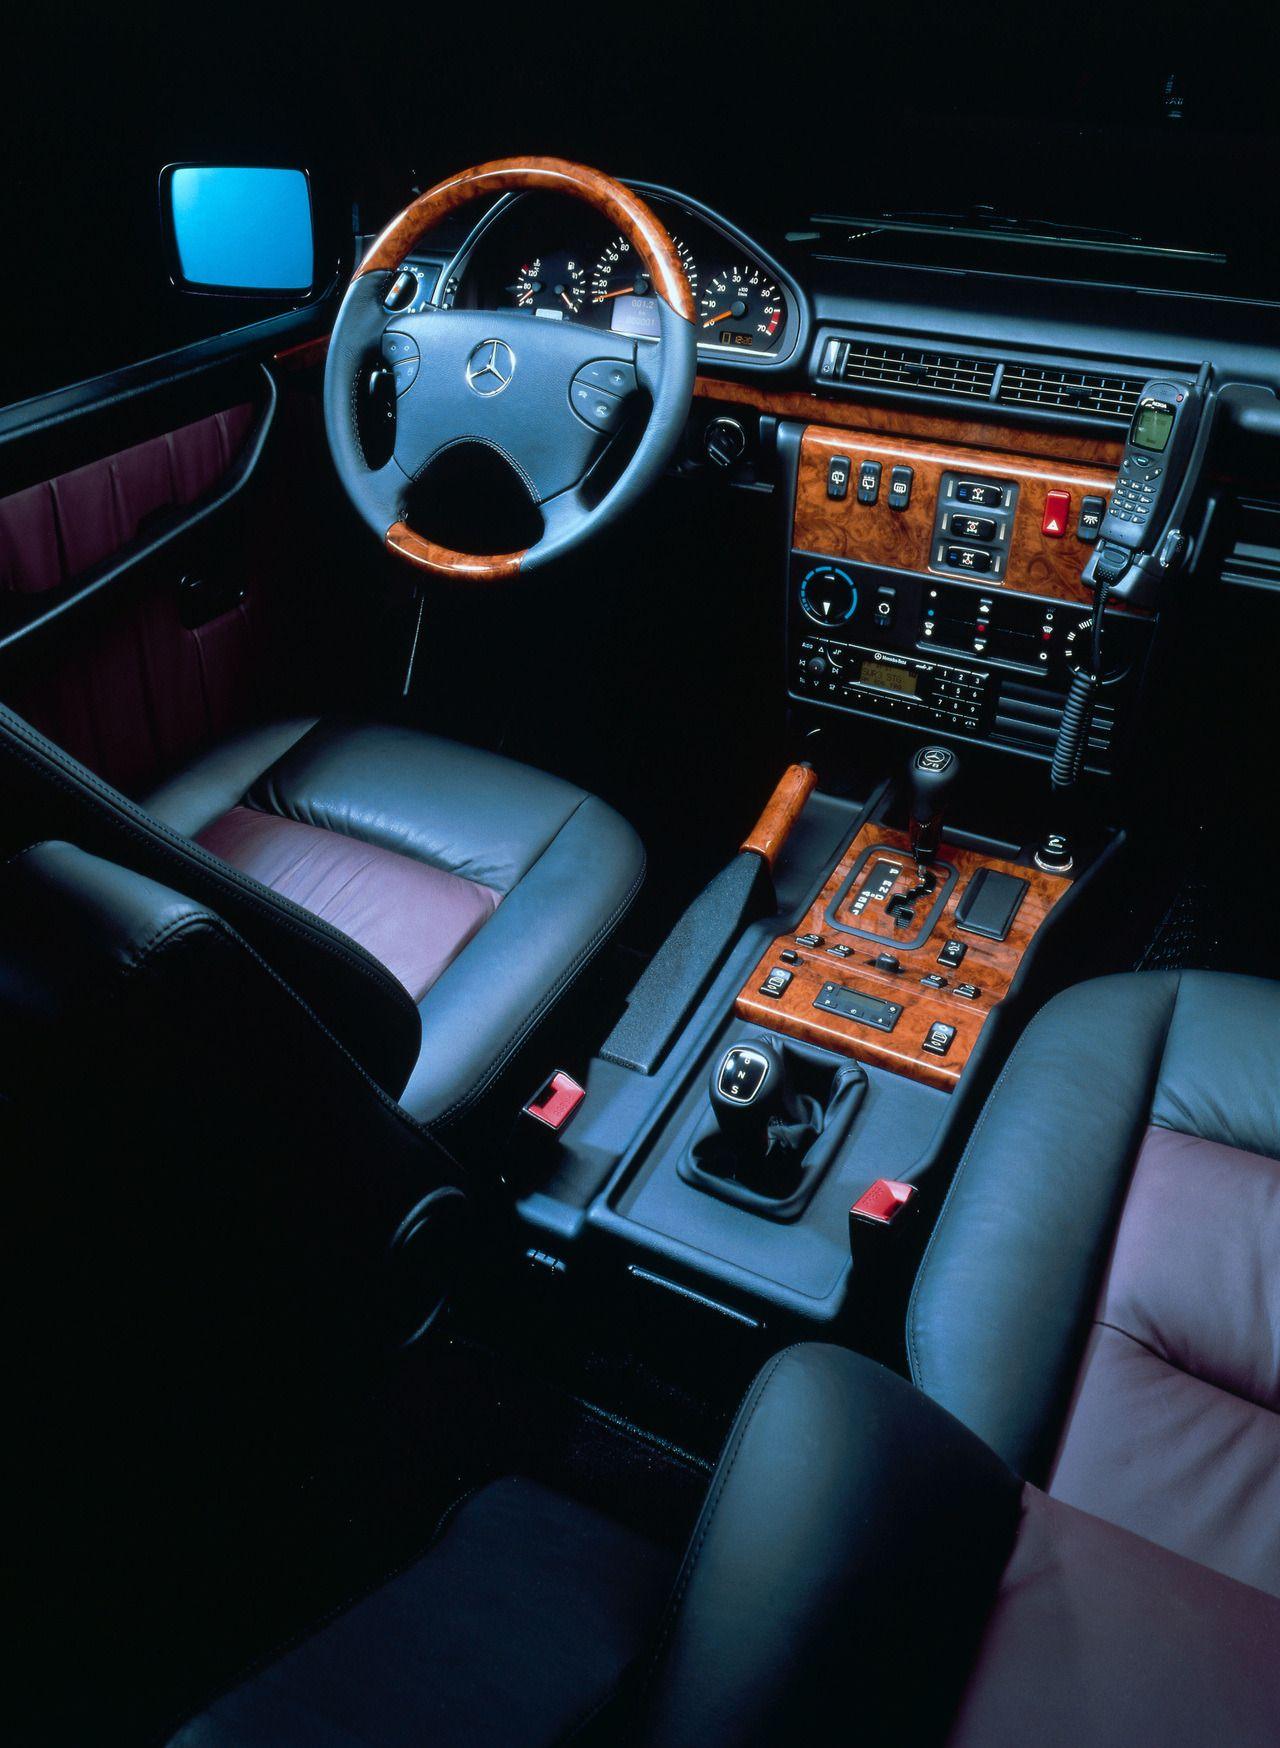 1993 Mercedes Benz 500 Ge Mercedes Interior Mercedes Benz Mercedes Benz G500